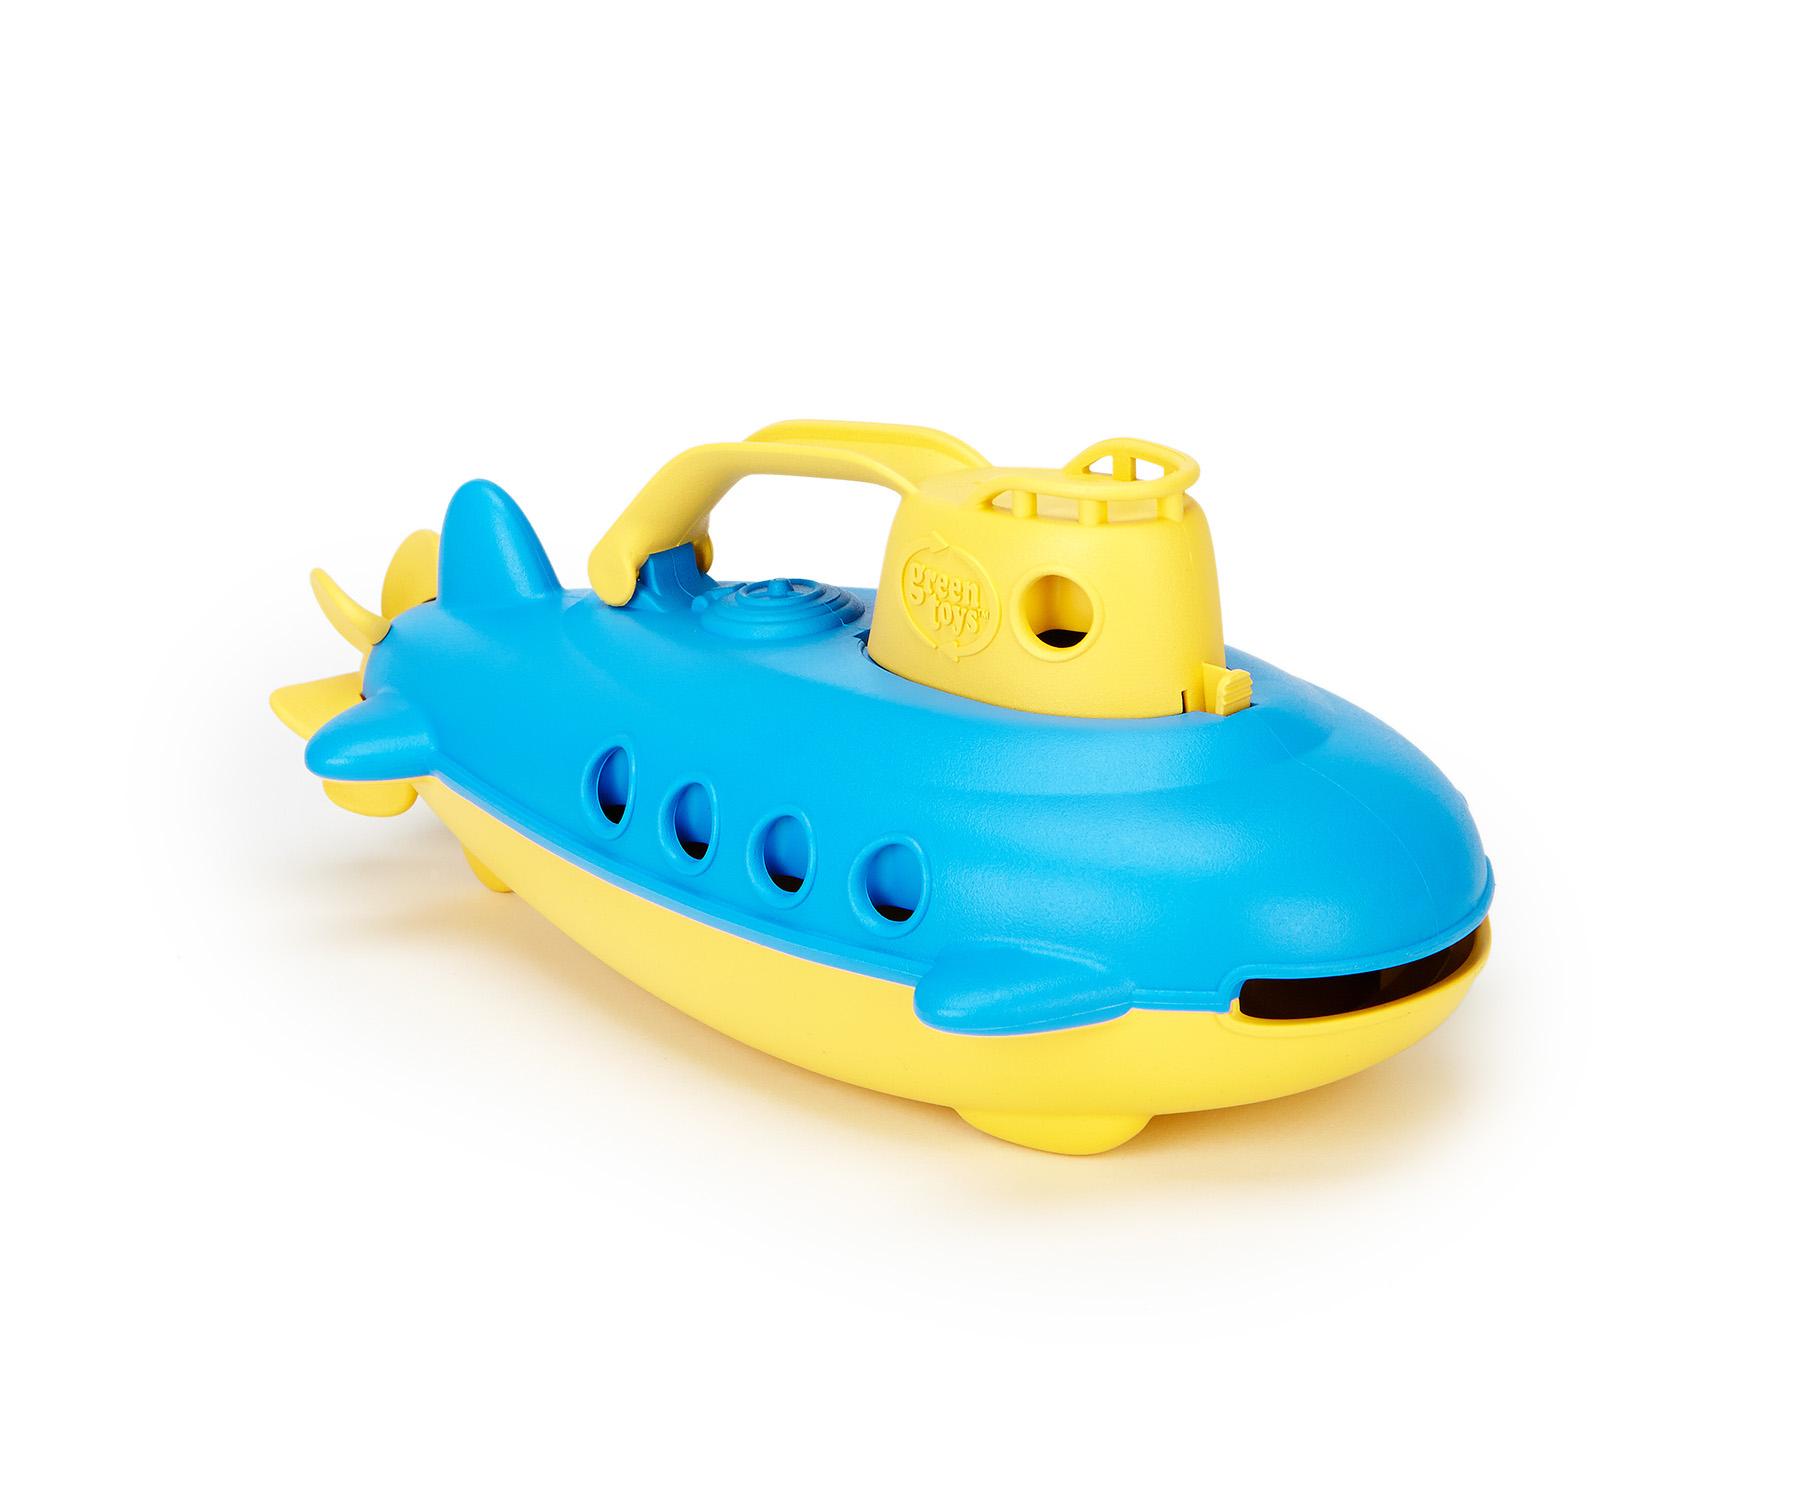 Green Toys Submarine, Yellow Top - Walmart.com